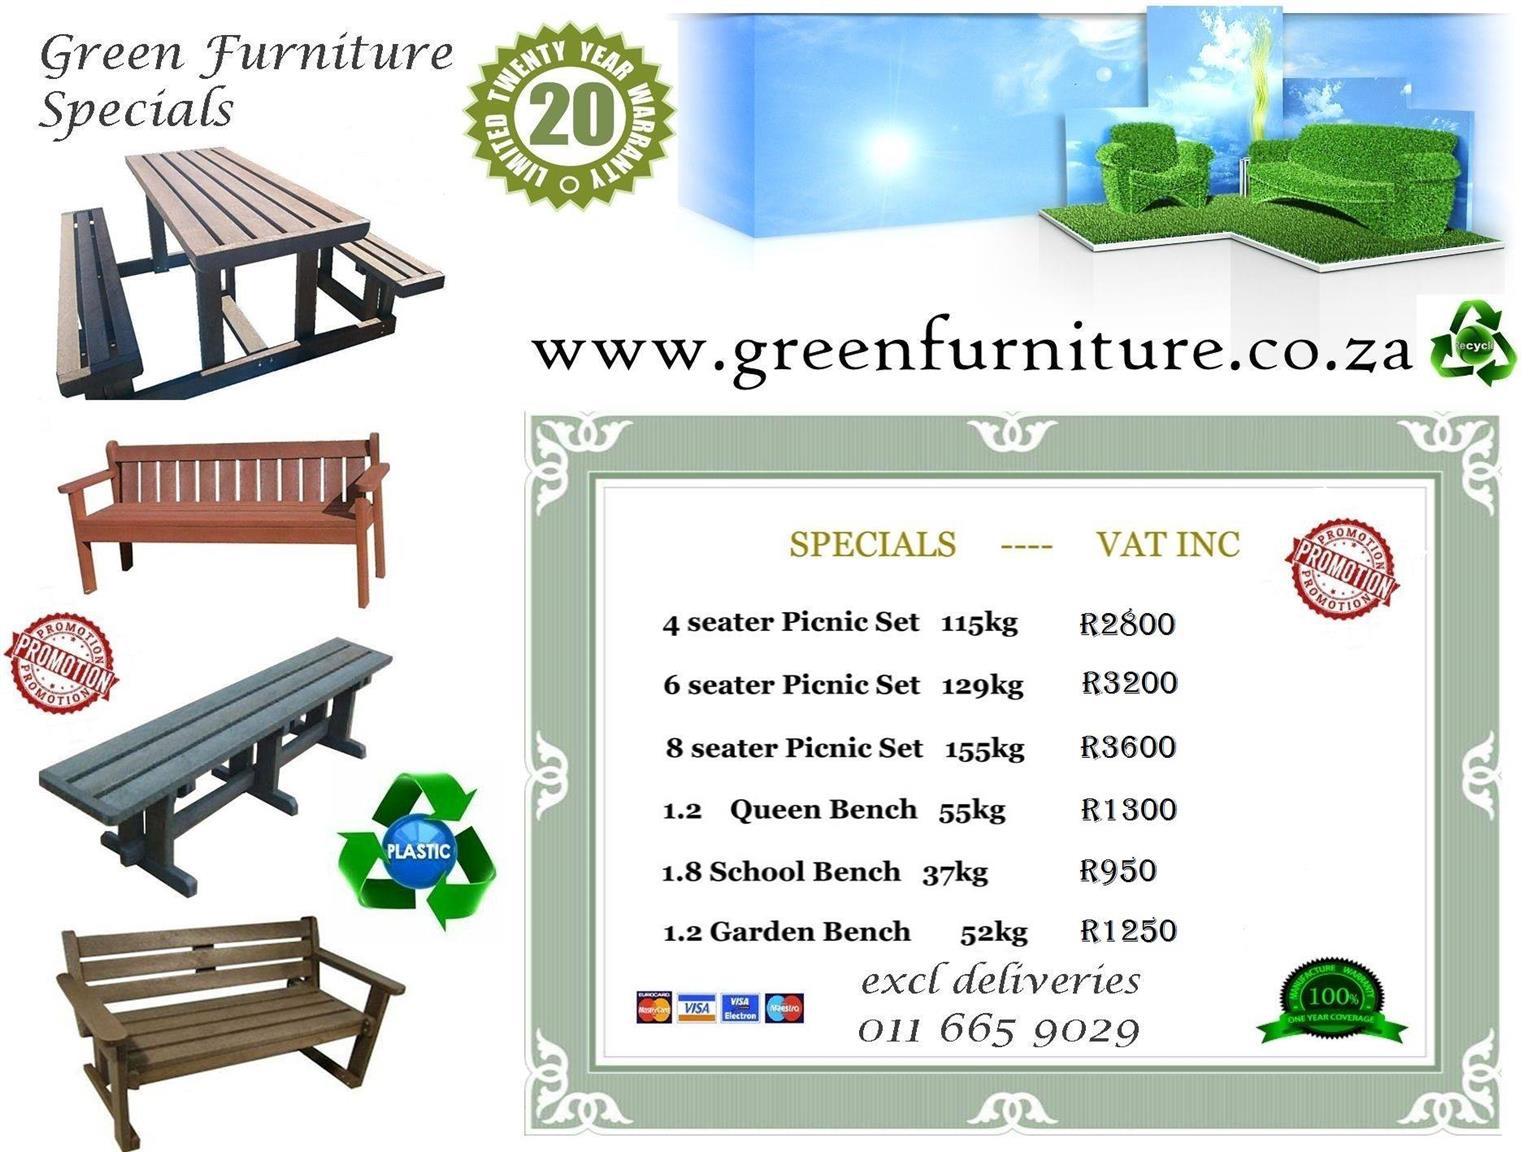 Garden,Lapa and Patio Furniture